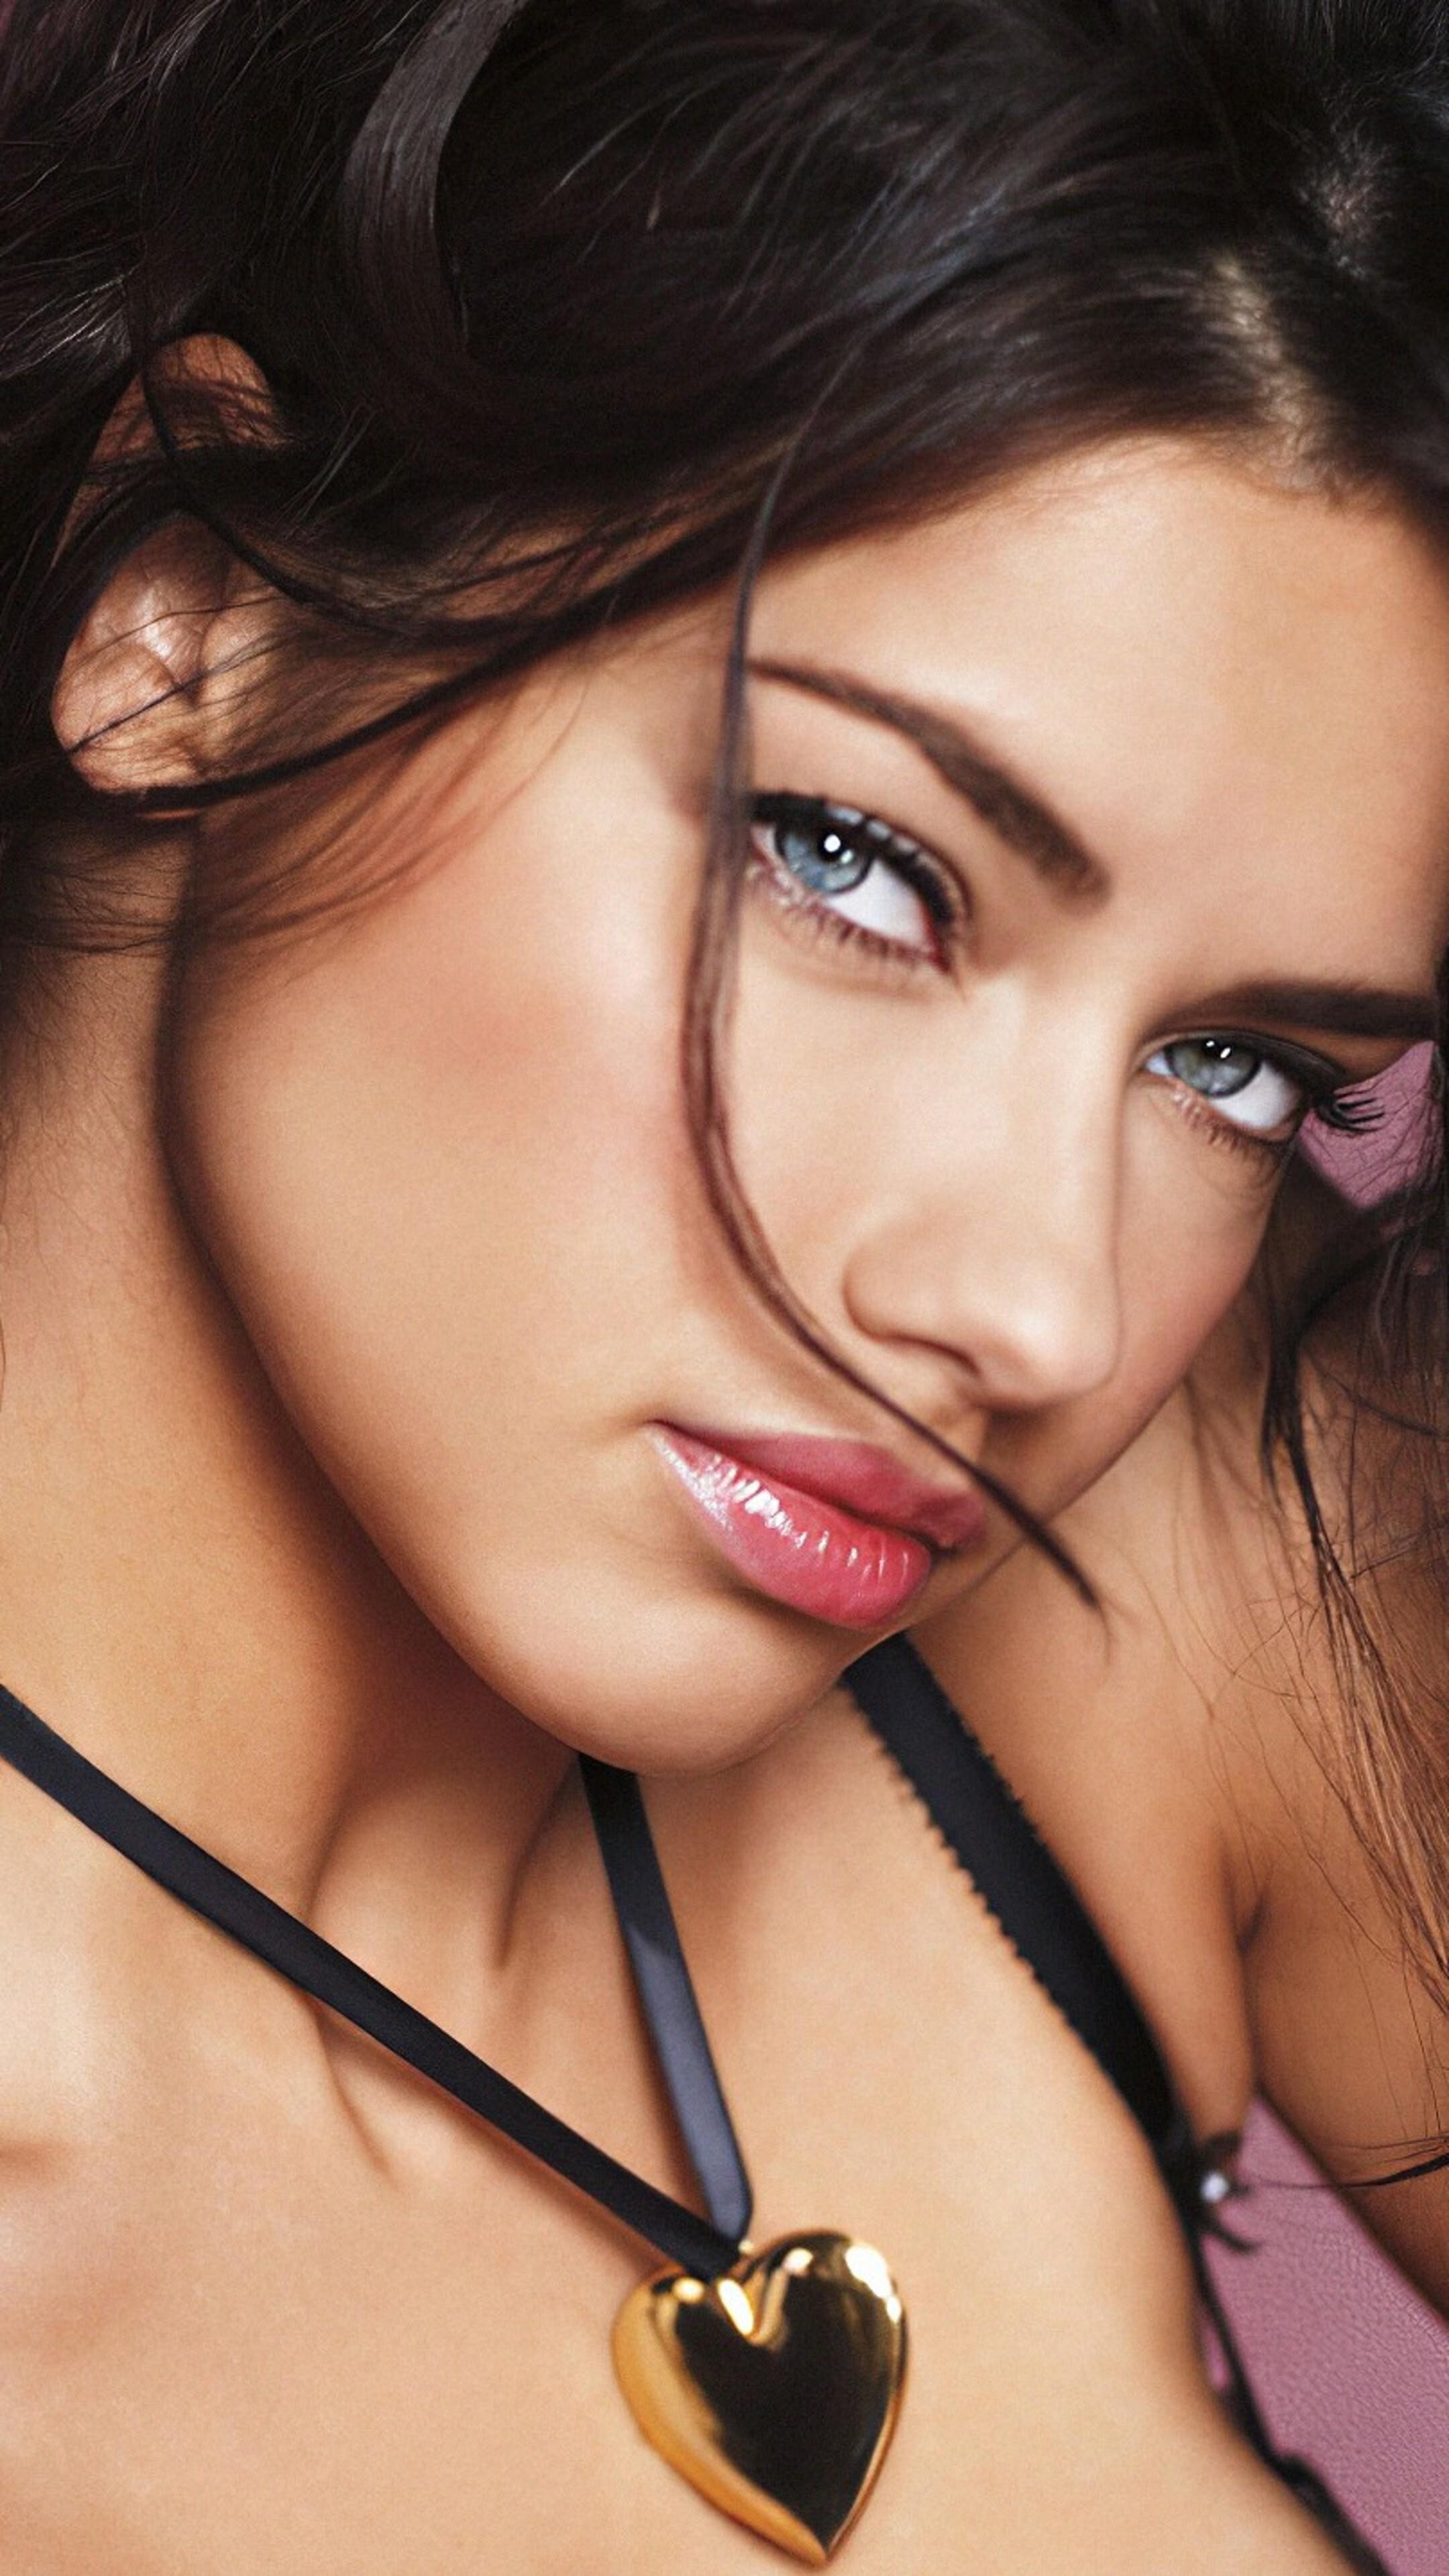 Adriana Lima, Beautiful, Women, Model, 4k Iphone 10,7,6s,6 - Adriana Lima Model Hd , HD Wallpaper & Backgrounds